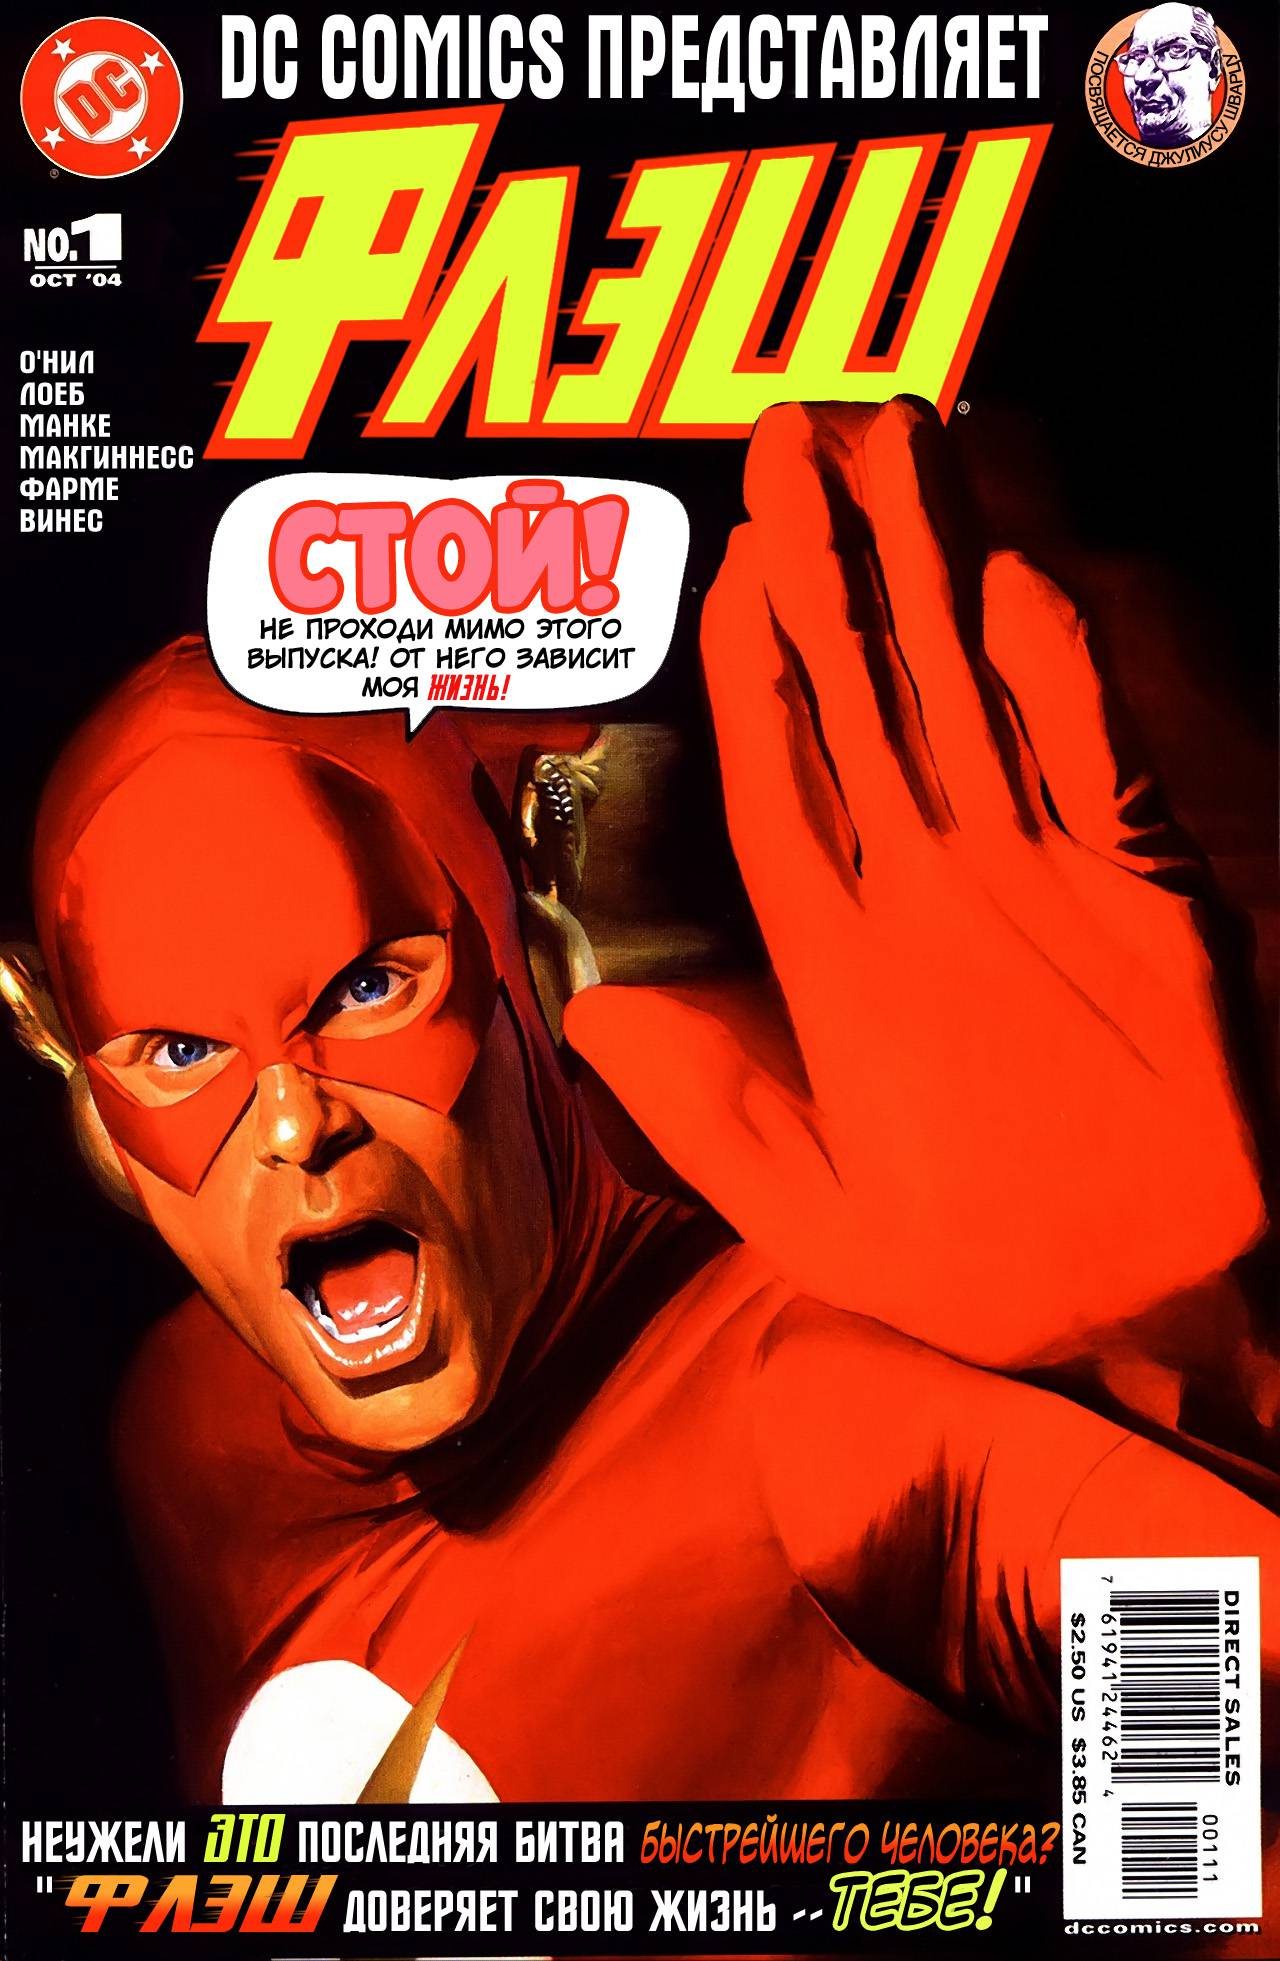 DC Комикс Представляет - Флэш онлайн